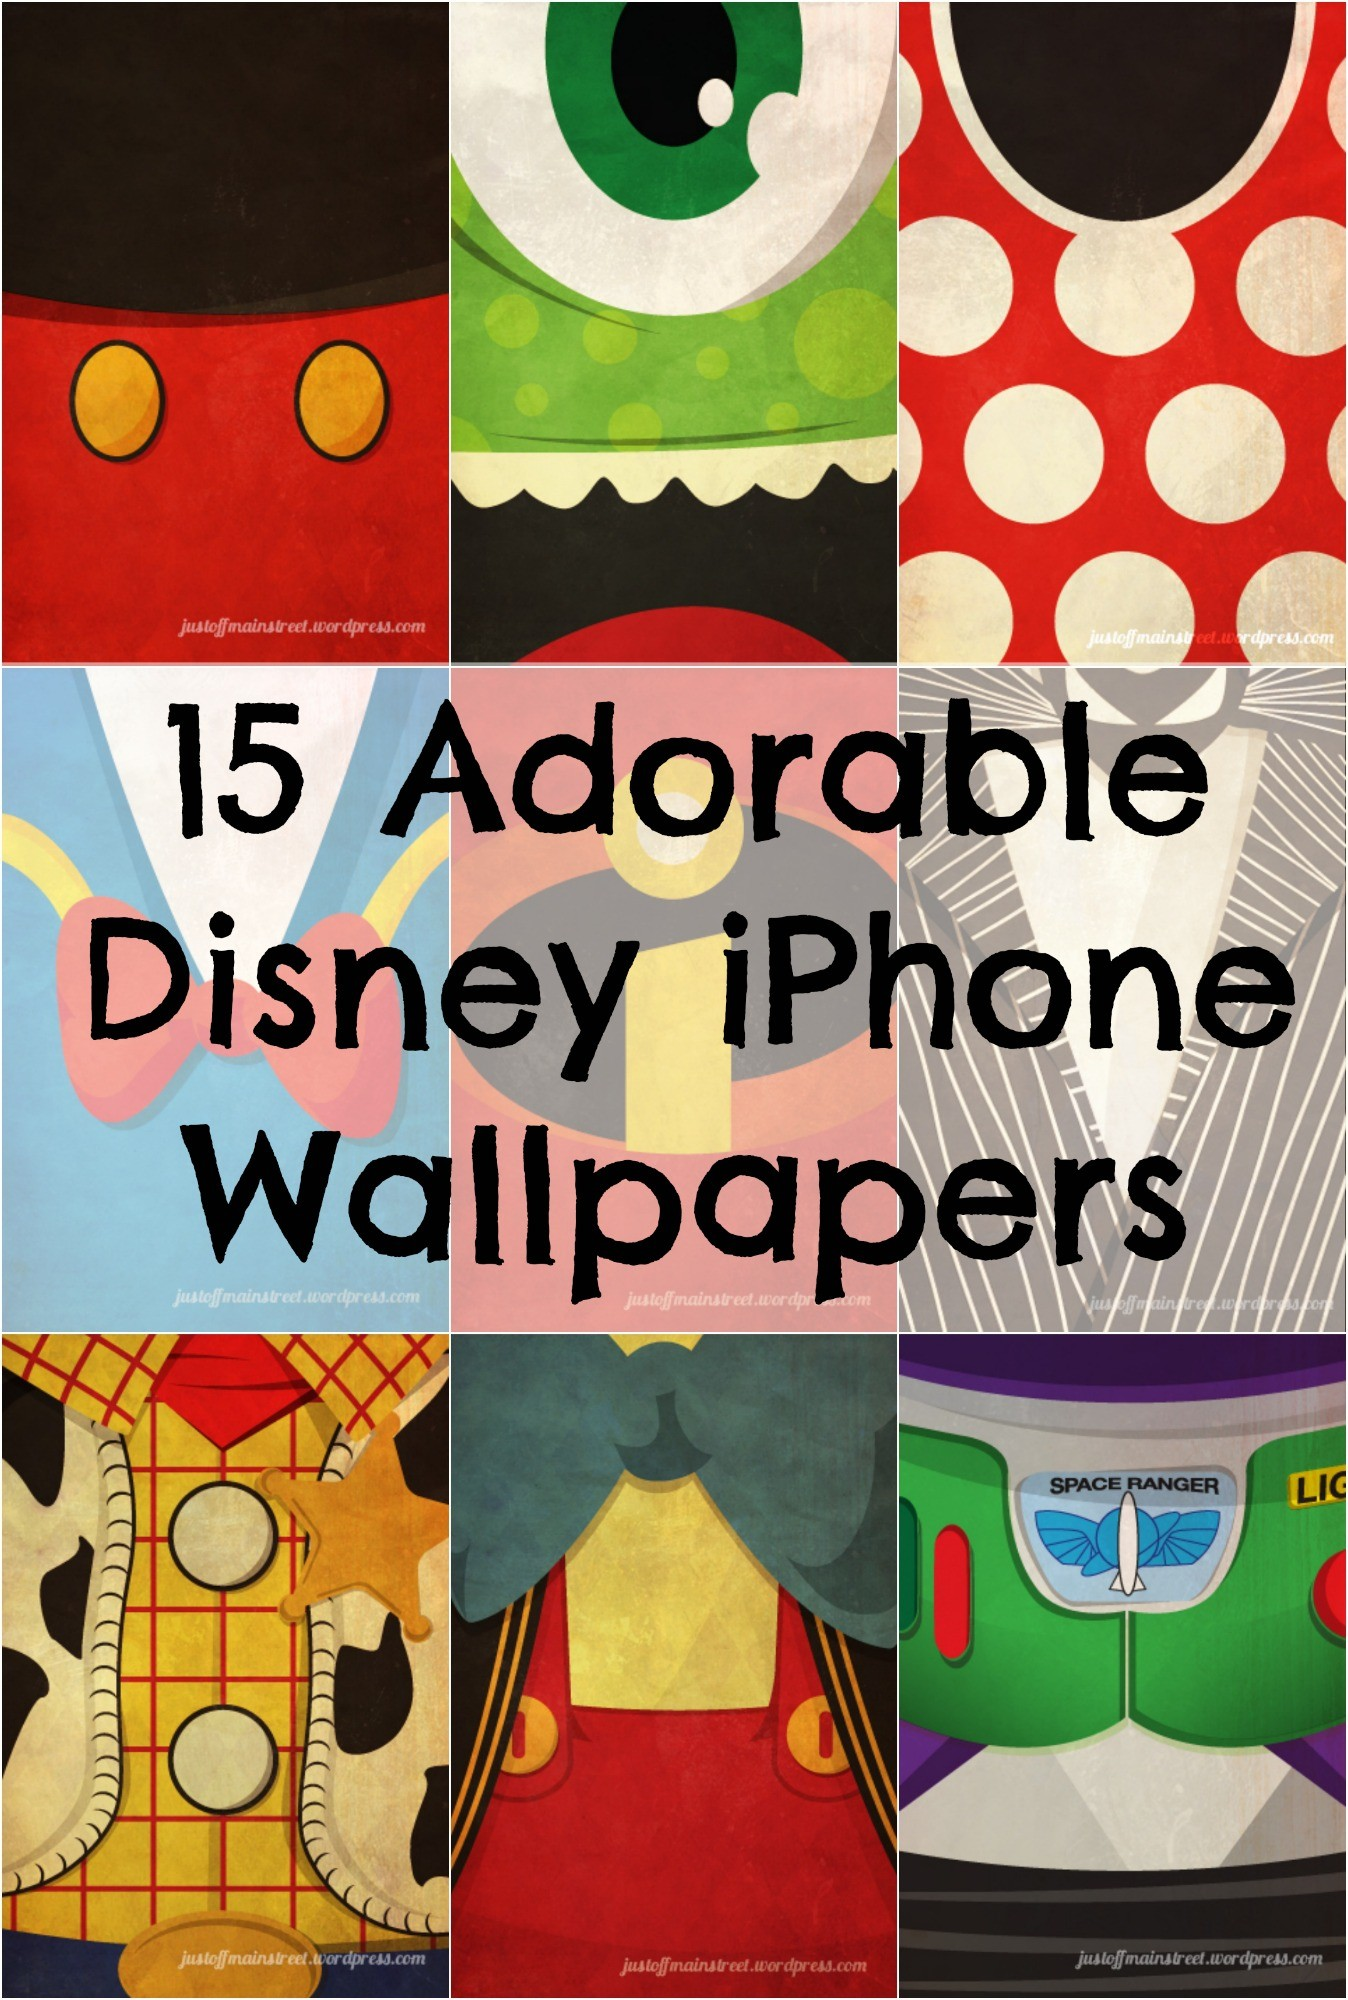 Tumblr Iphone 5 Wallpaper Disney 15-iphone-wallpaper-collage2.jpg